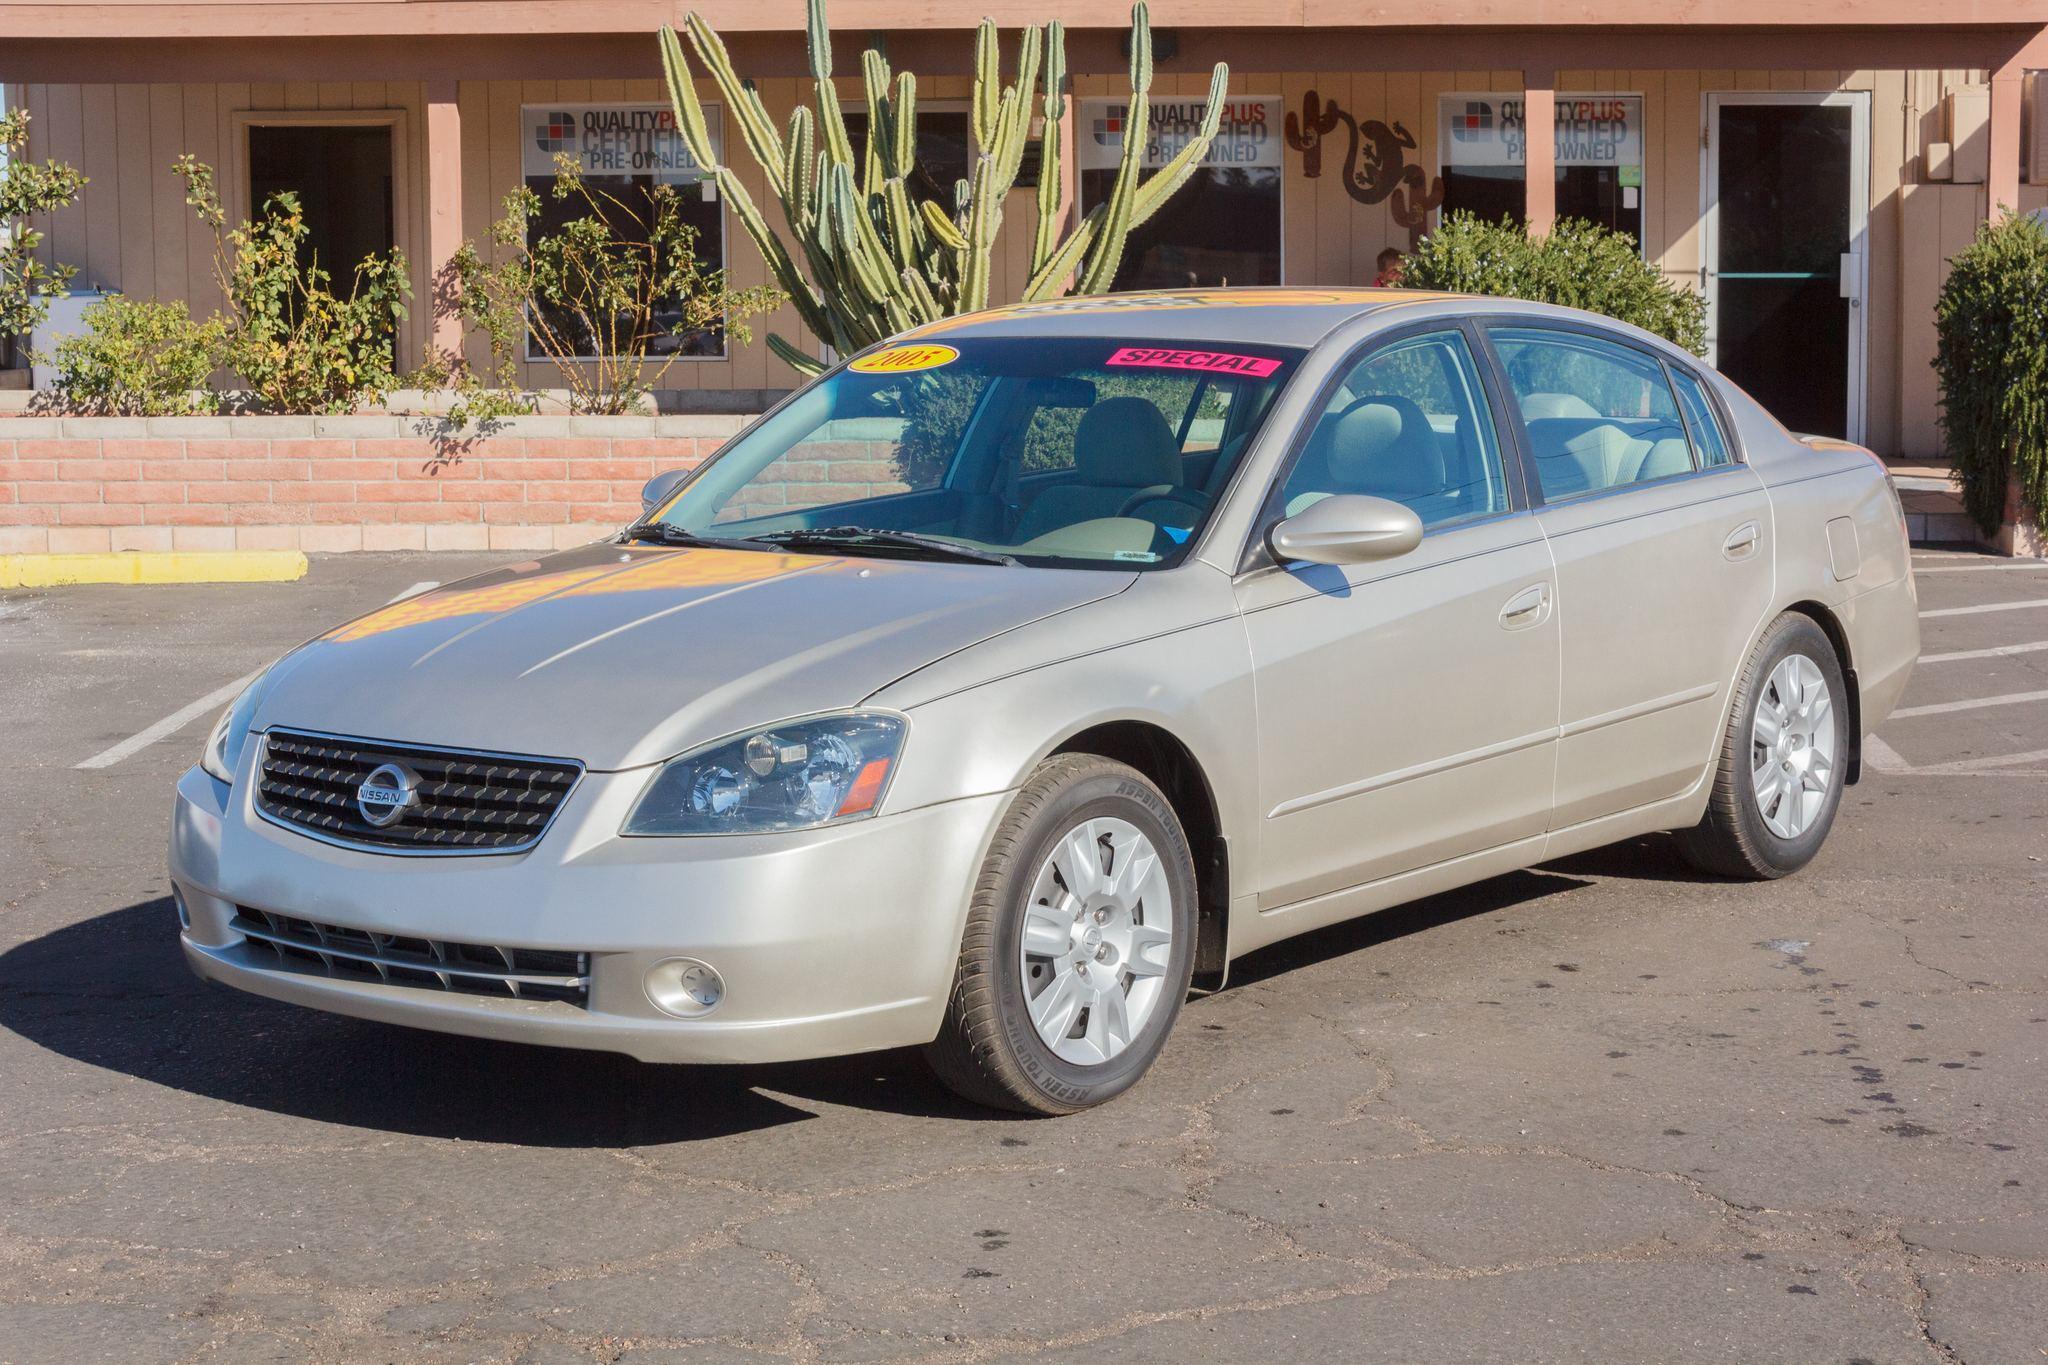 Photo of 2005 Nissan Altima 4d Sedan S Coral Sand Metallic